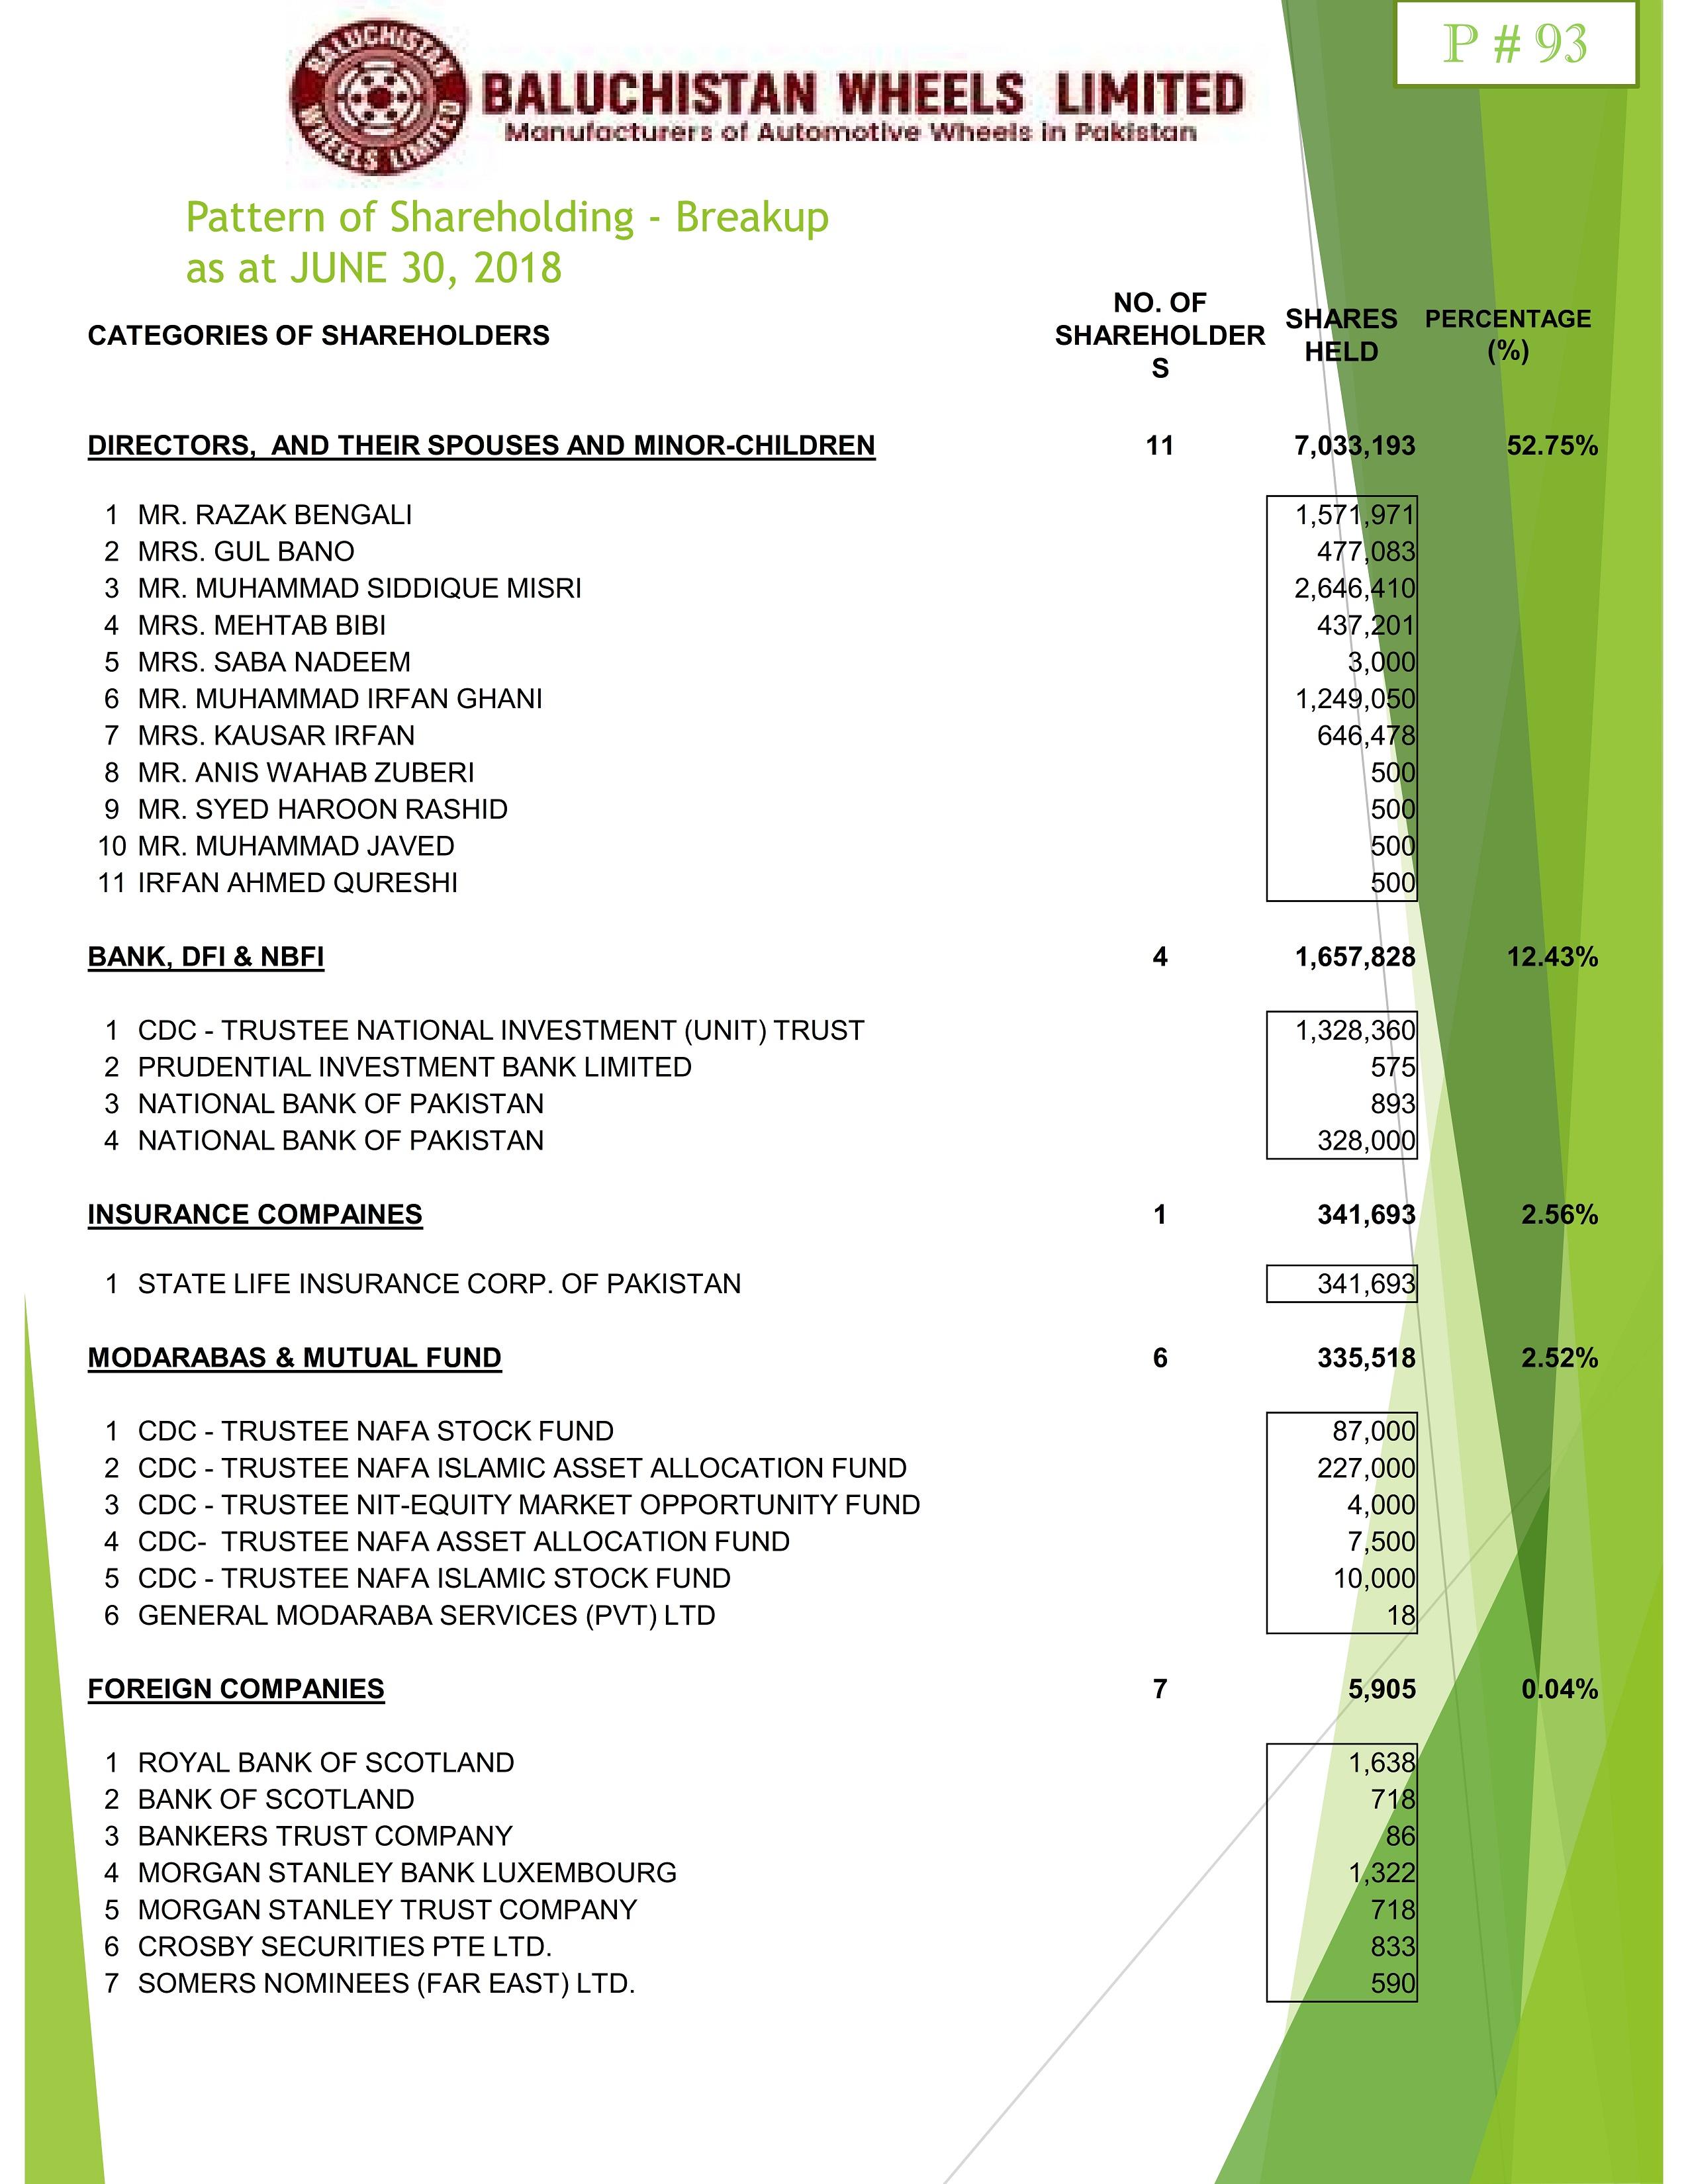 Pattern of Shareholding – Baluchistan Wheels Limited